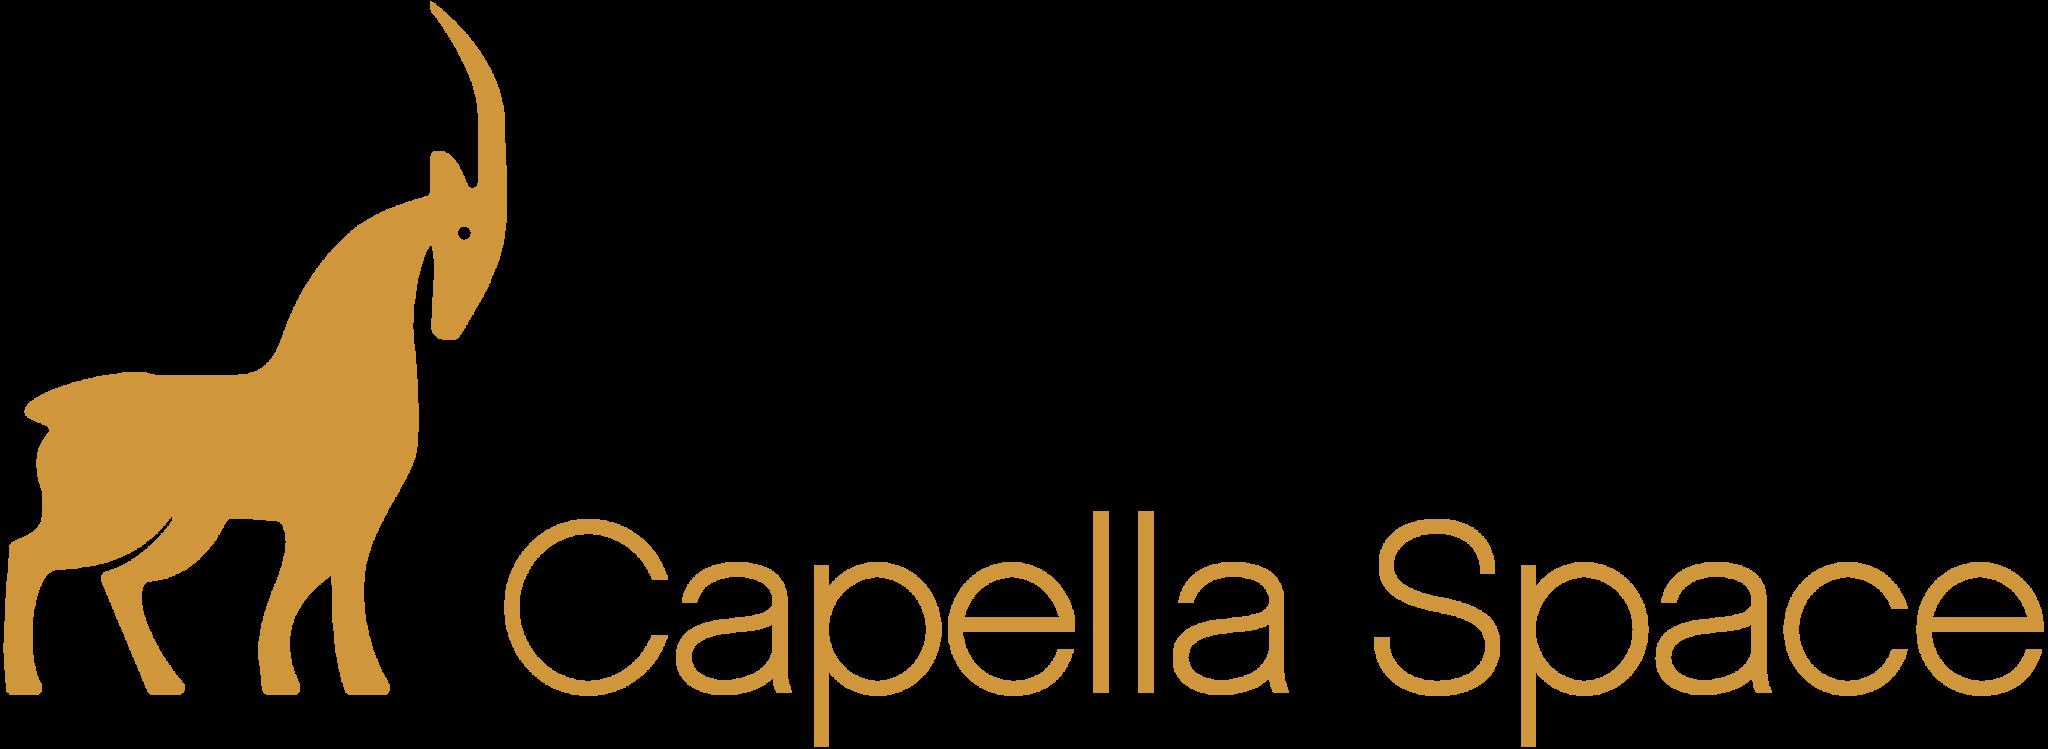 capella_sapce_horizontal_full_logo_coppper-1-2048x749 (1)